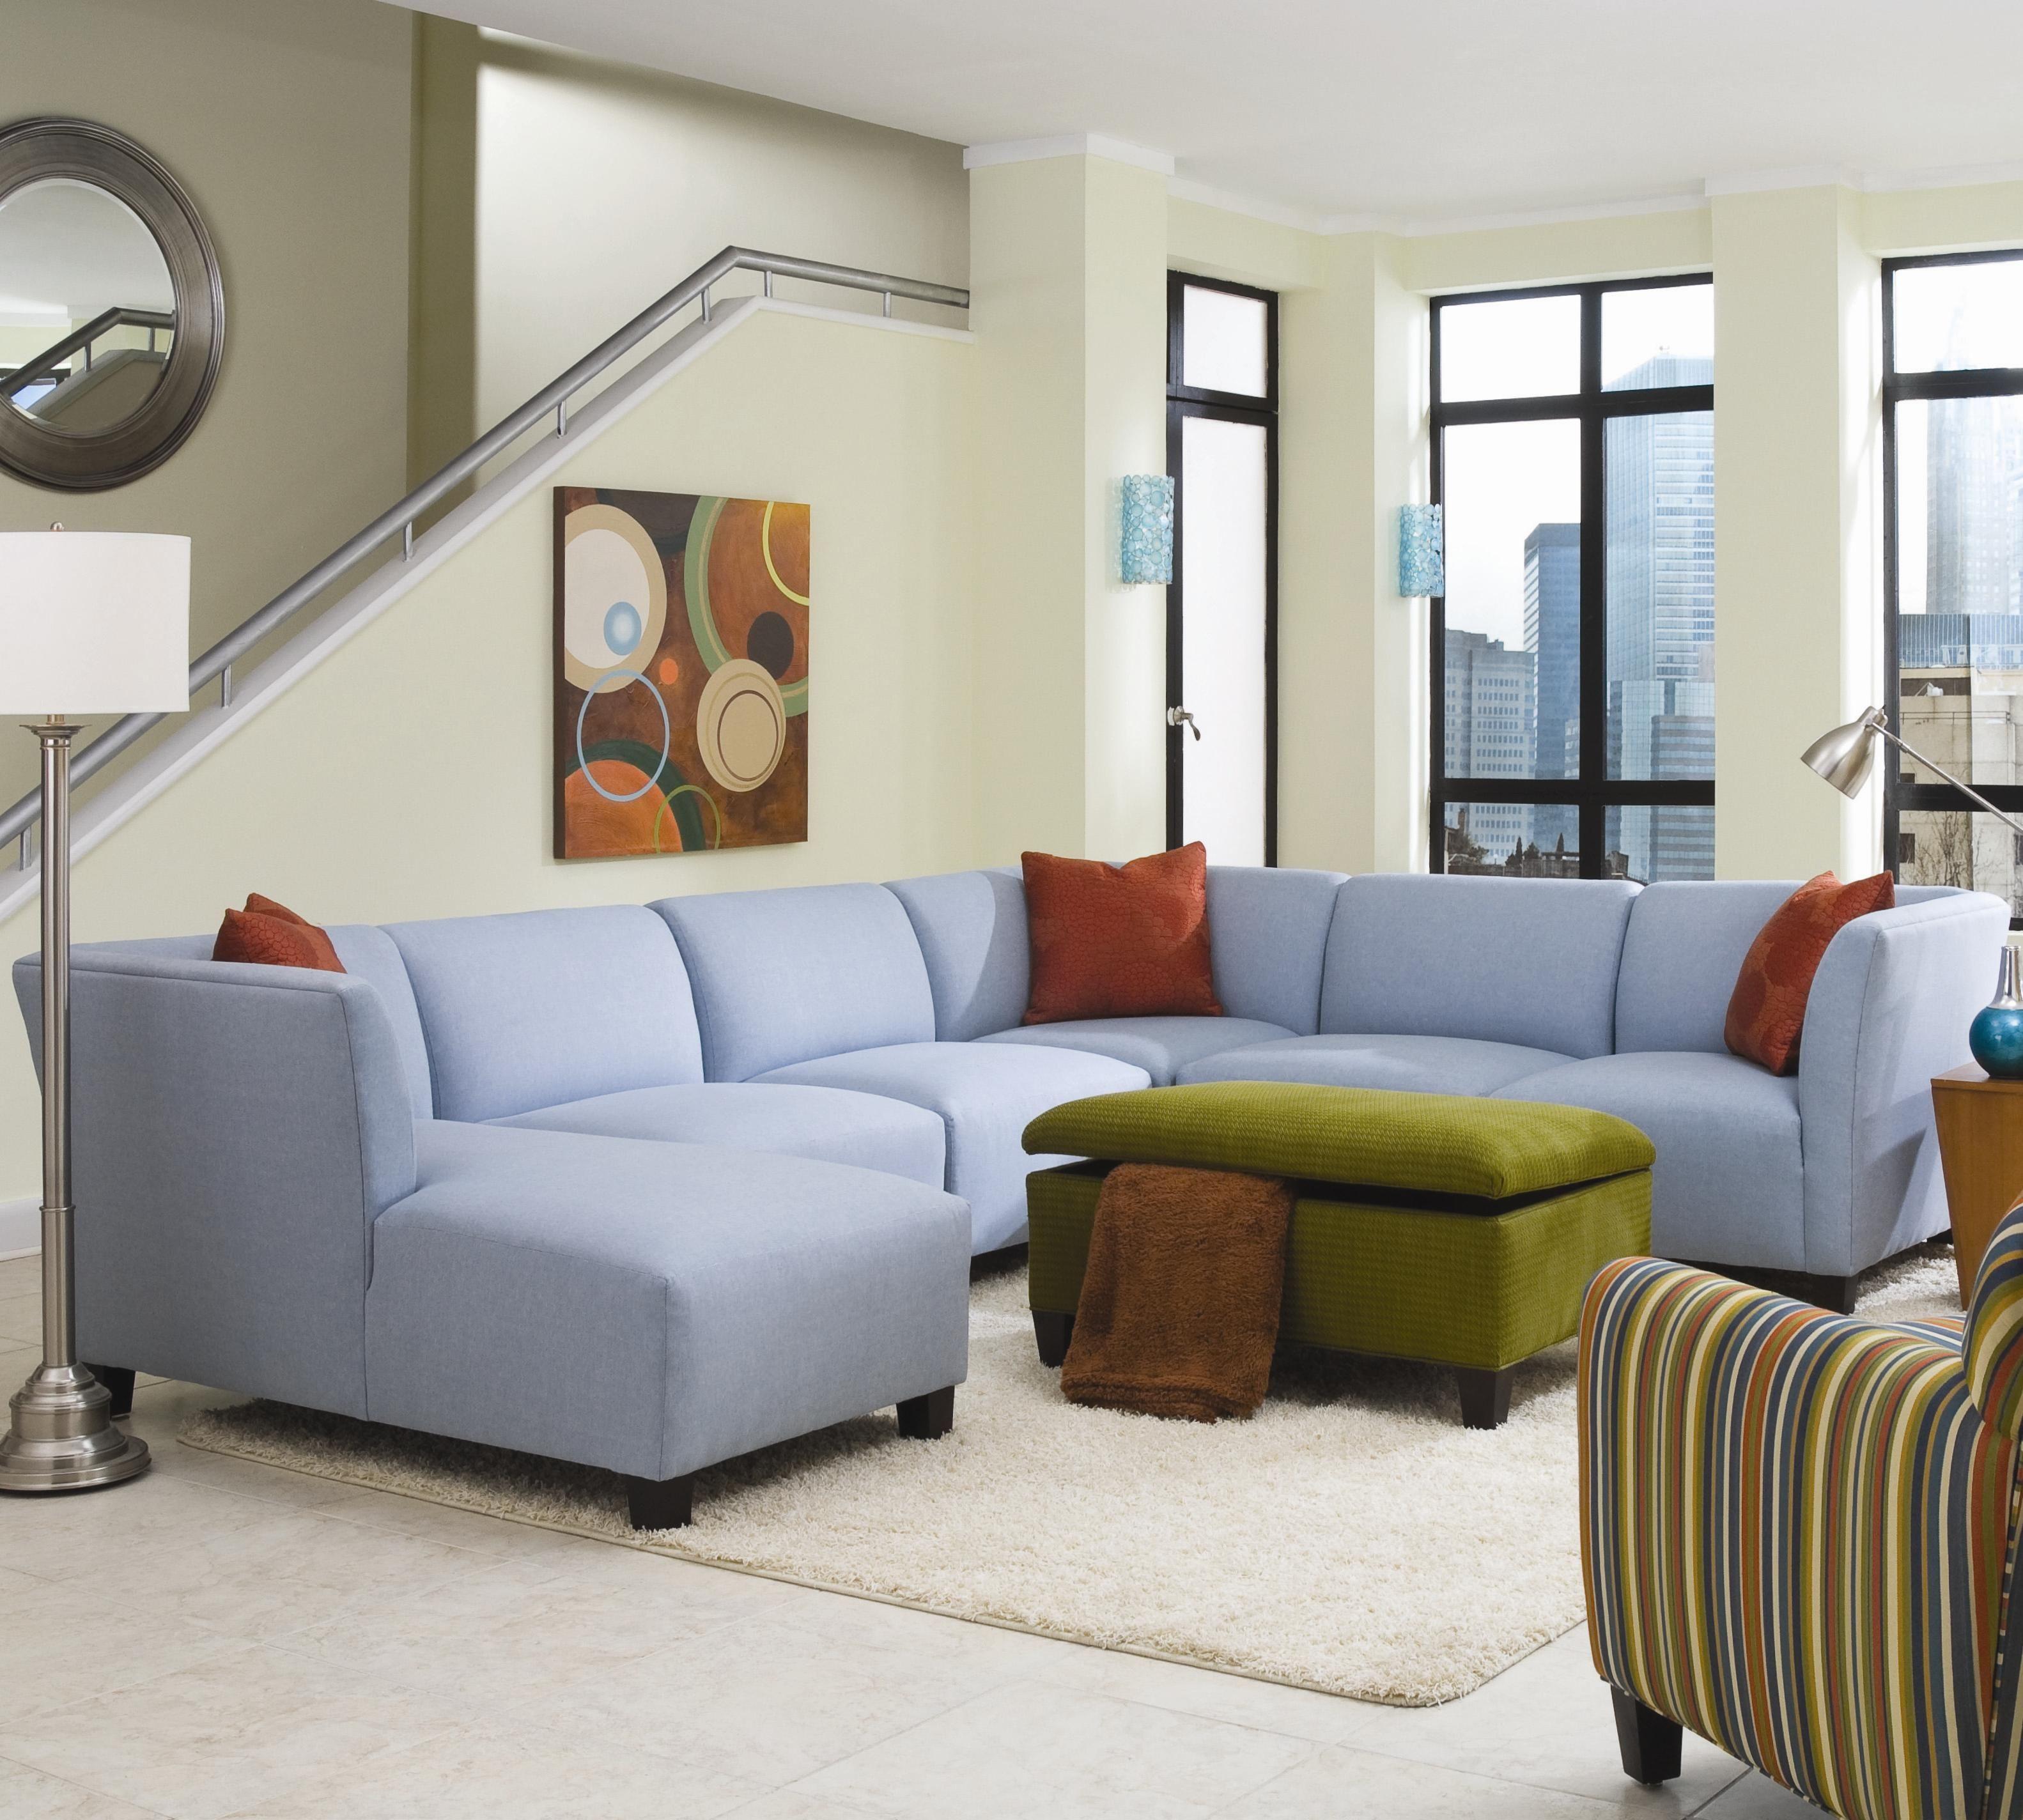 Sensational Home Summertime Shop Sofa Furniture Sofa Furniture Short Links Chair Design For Home Short Linksinfo